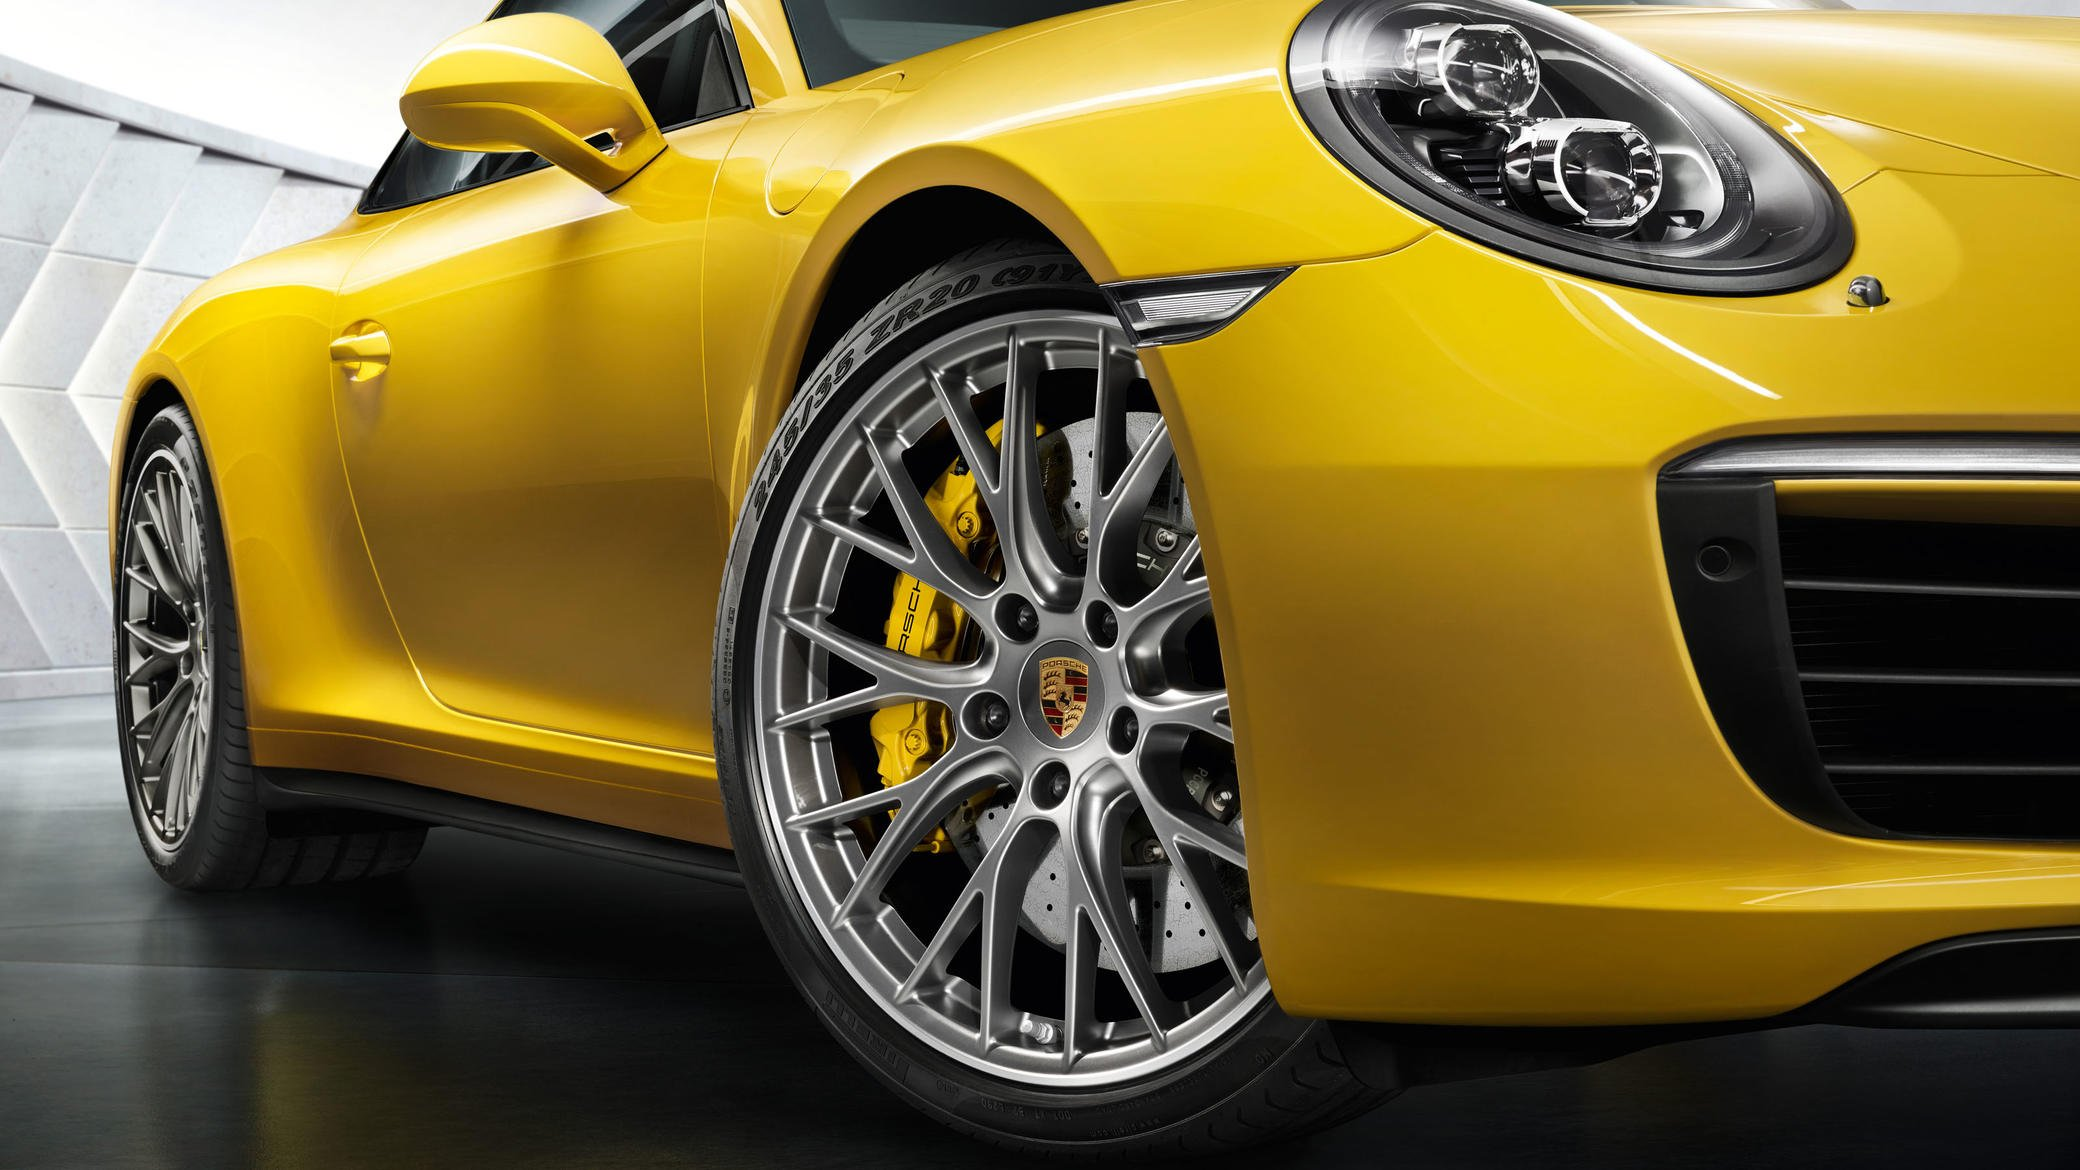 porsche 911 991 Carrera 4S Cabriolet 420 ch mk2 2015-2019 03